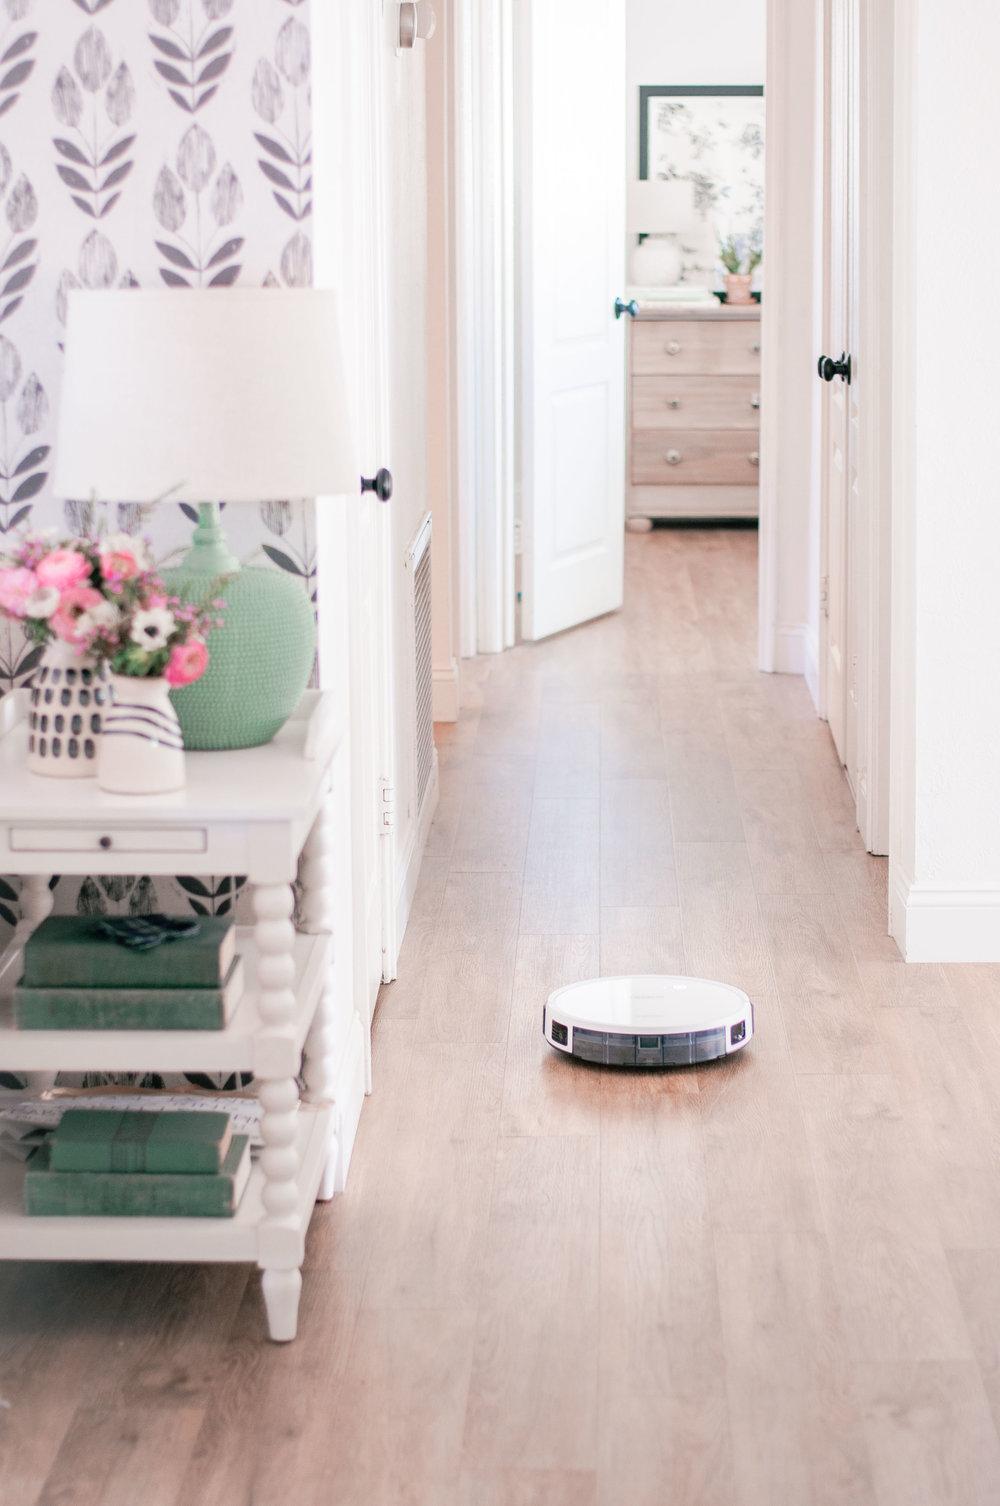 Robot Vacuum Reviews